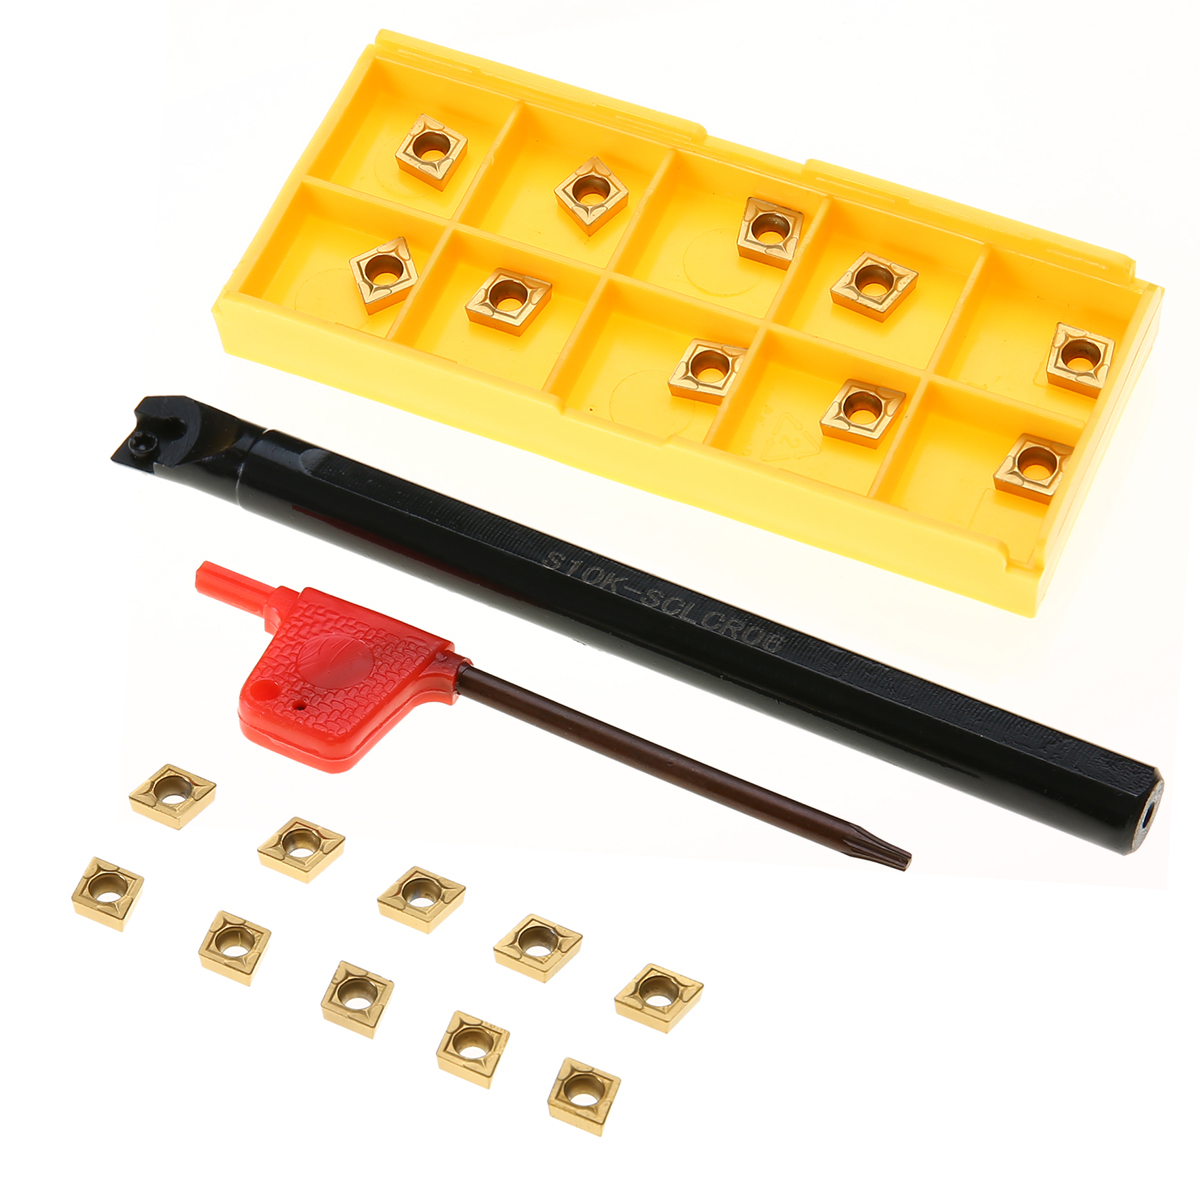 1pc S10K-SCLCR06 chato barra ferramenta titular + 10 pçs CCMT060204-HM inserções de carboneto chave para torno torneamento ferramenta